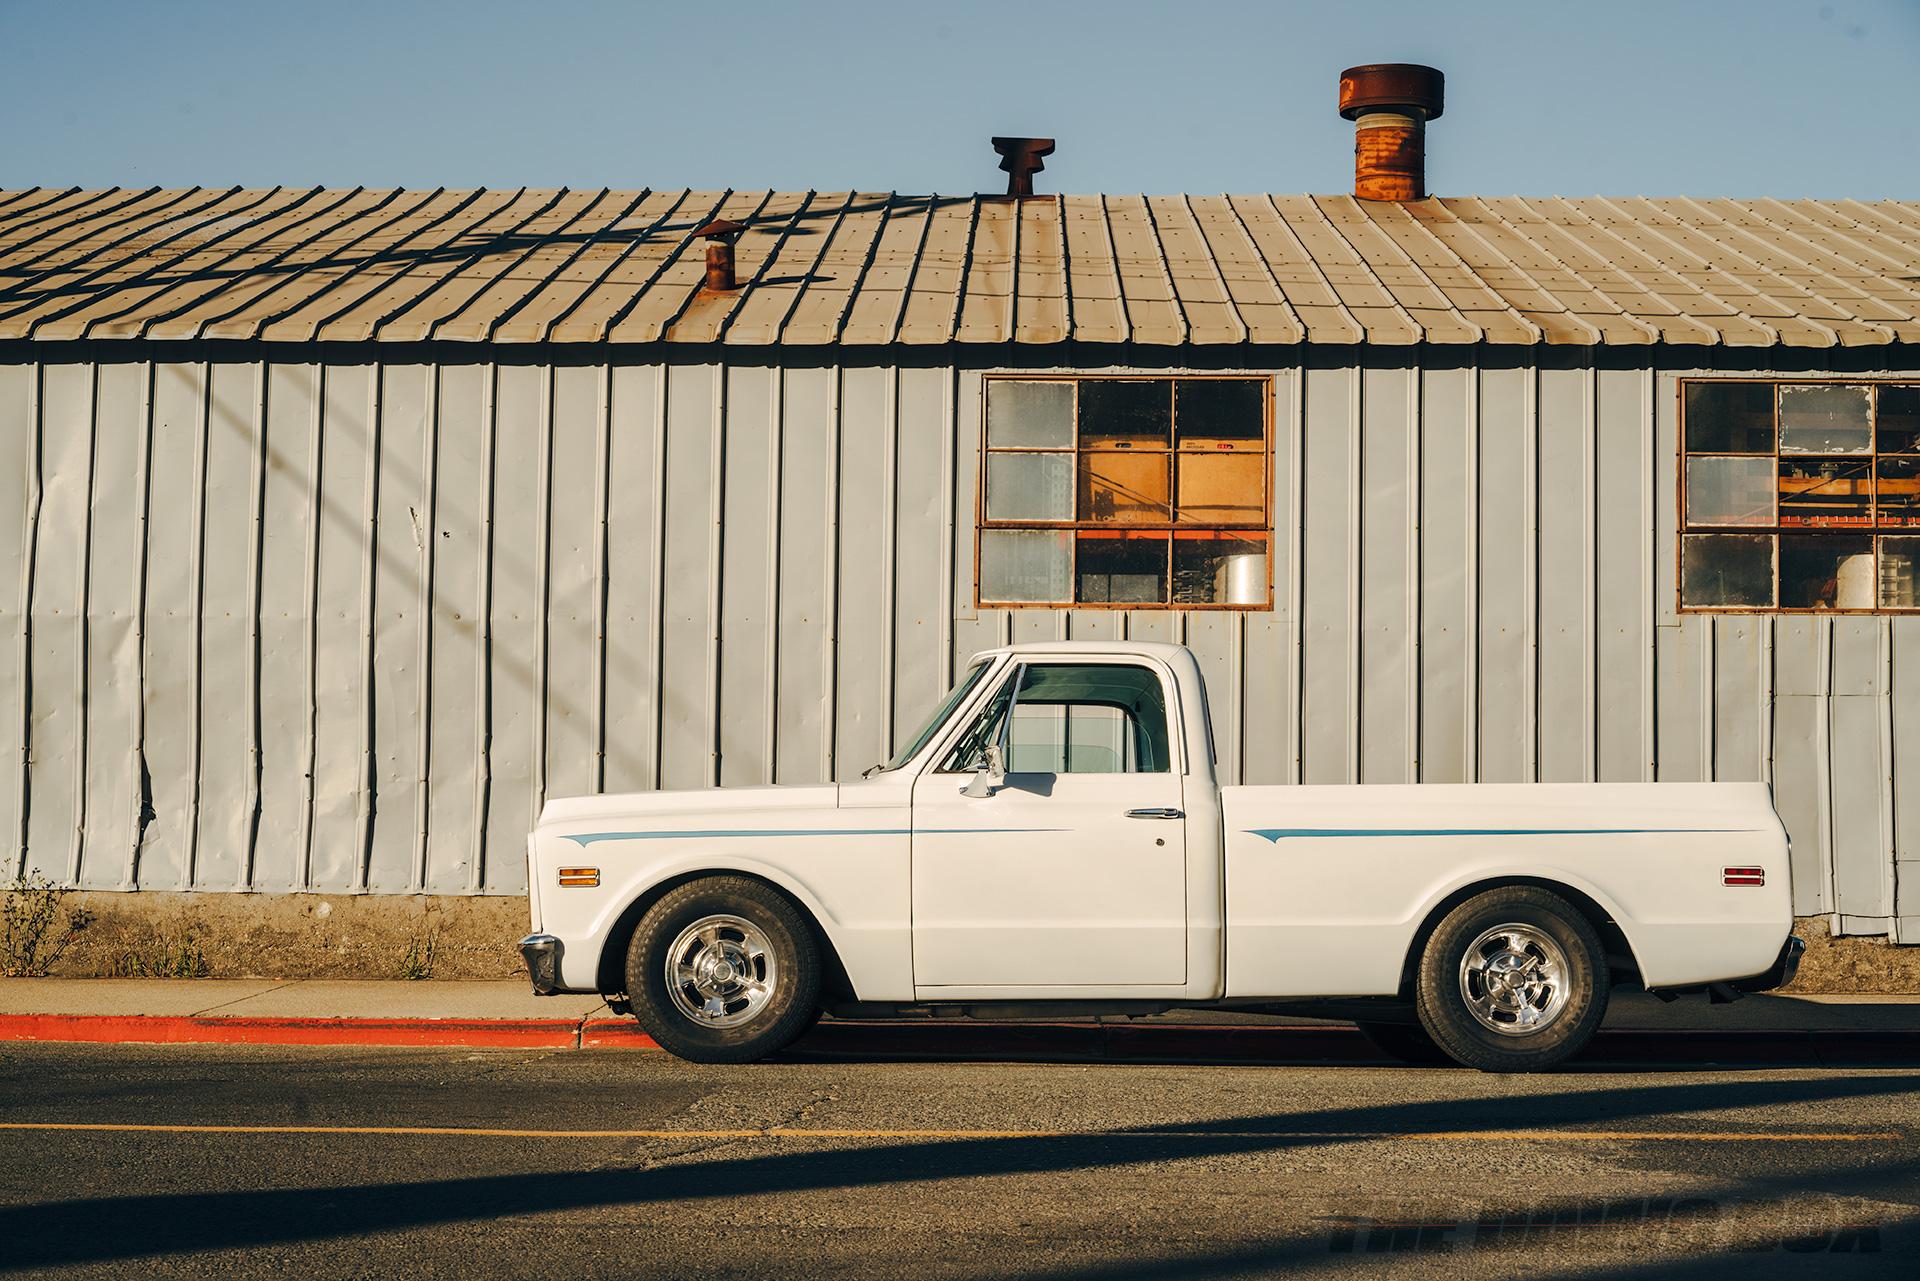 Mike Hegarty's white 1971 Chevrolet C10